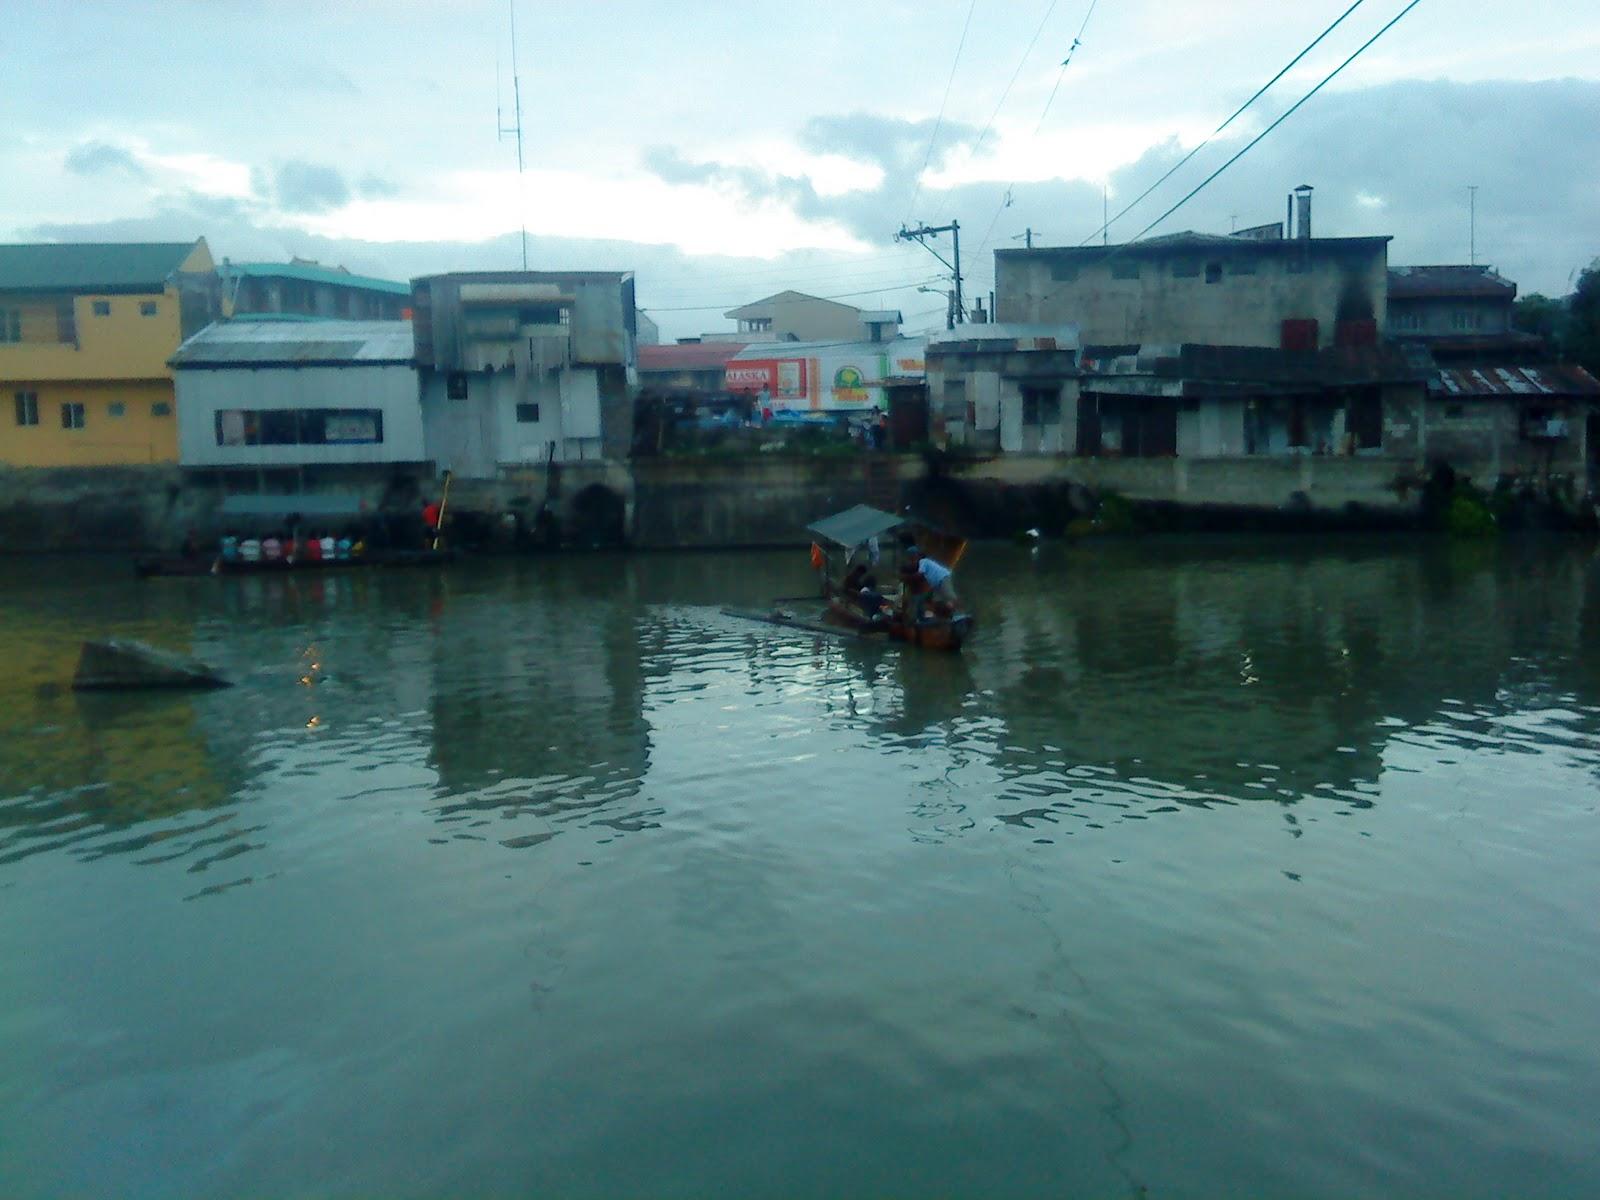 http://blogs.sacbee.com/photos/2009/10/philippines-worst-flooding-in